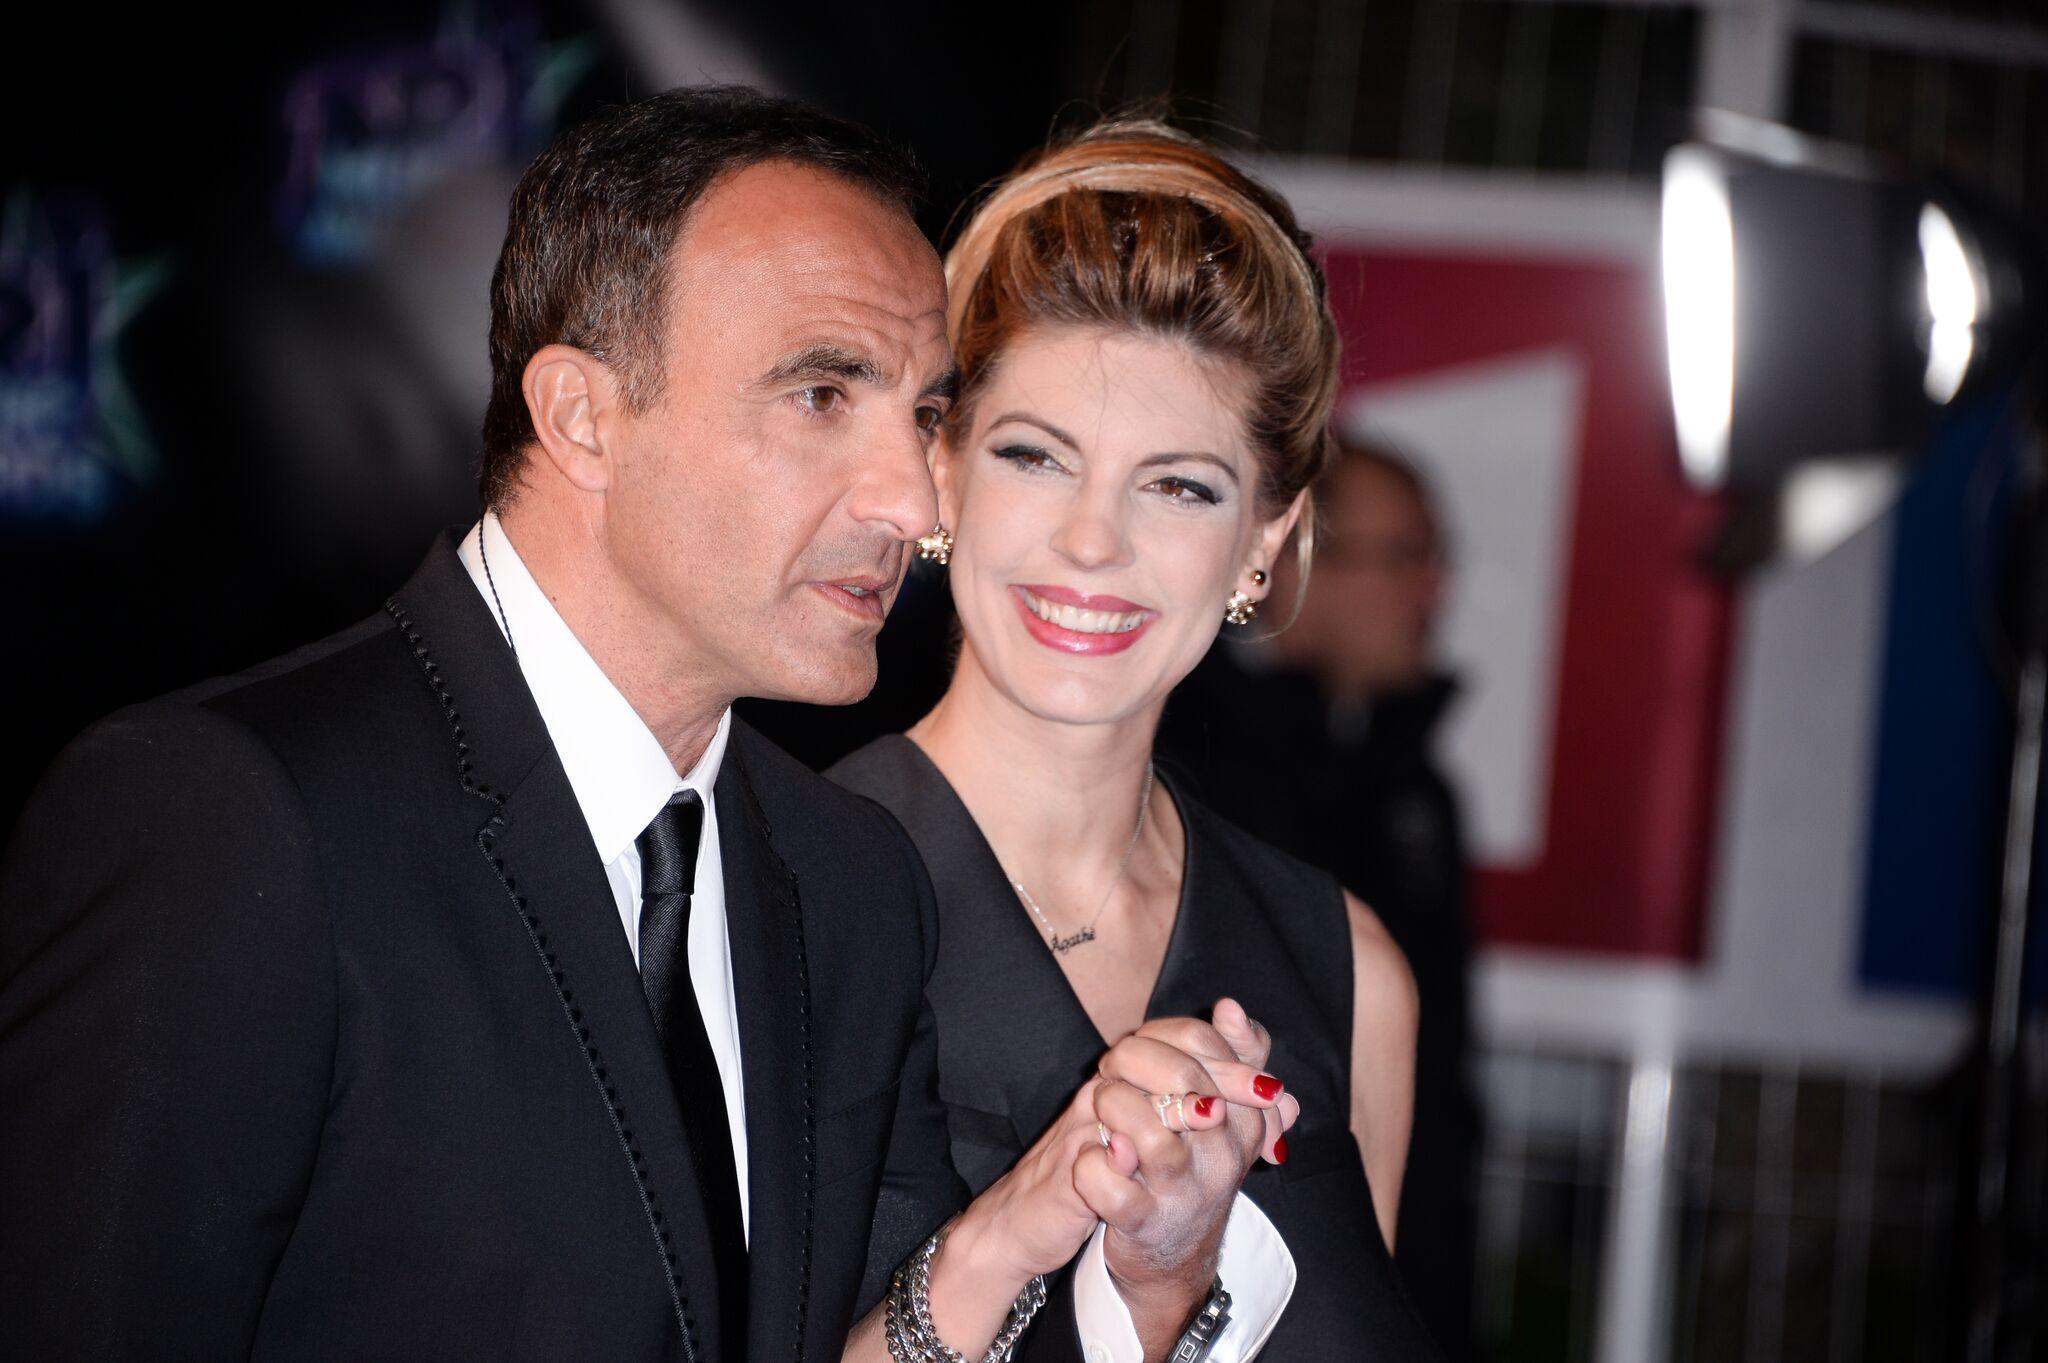 Nikos et sa compagne Tina. l Source: Getty Images